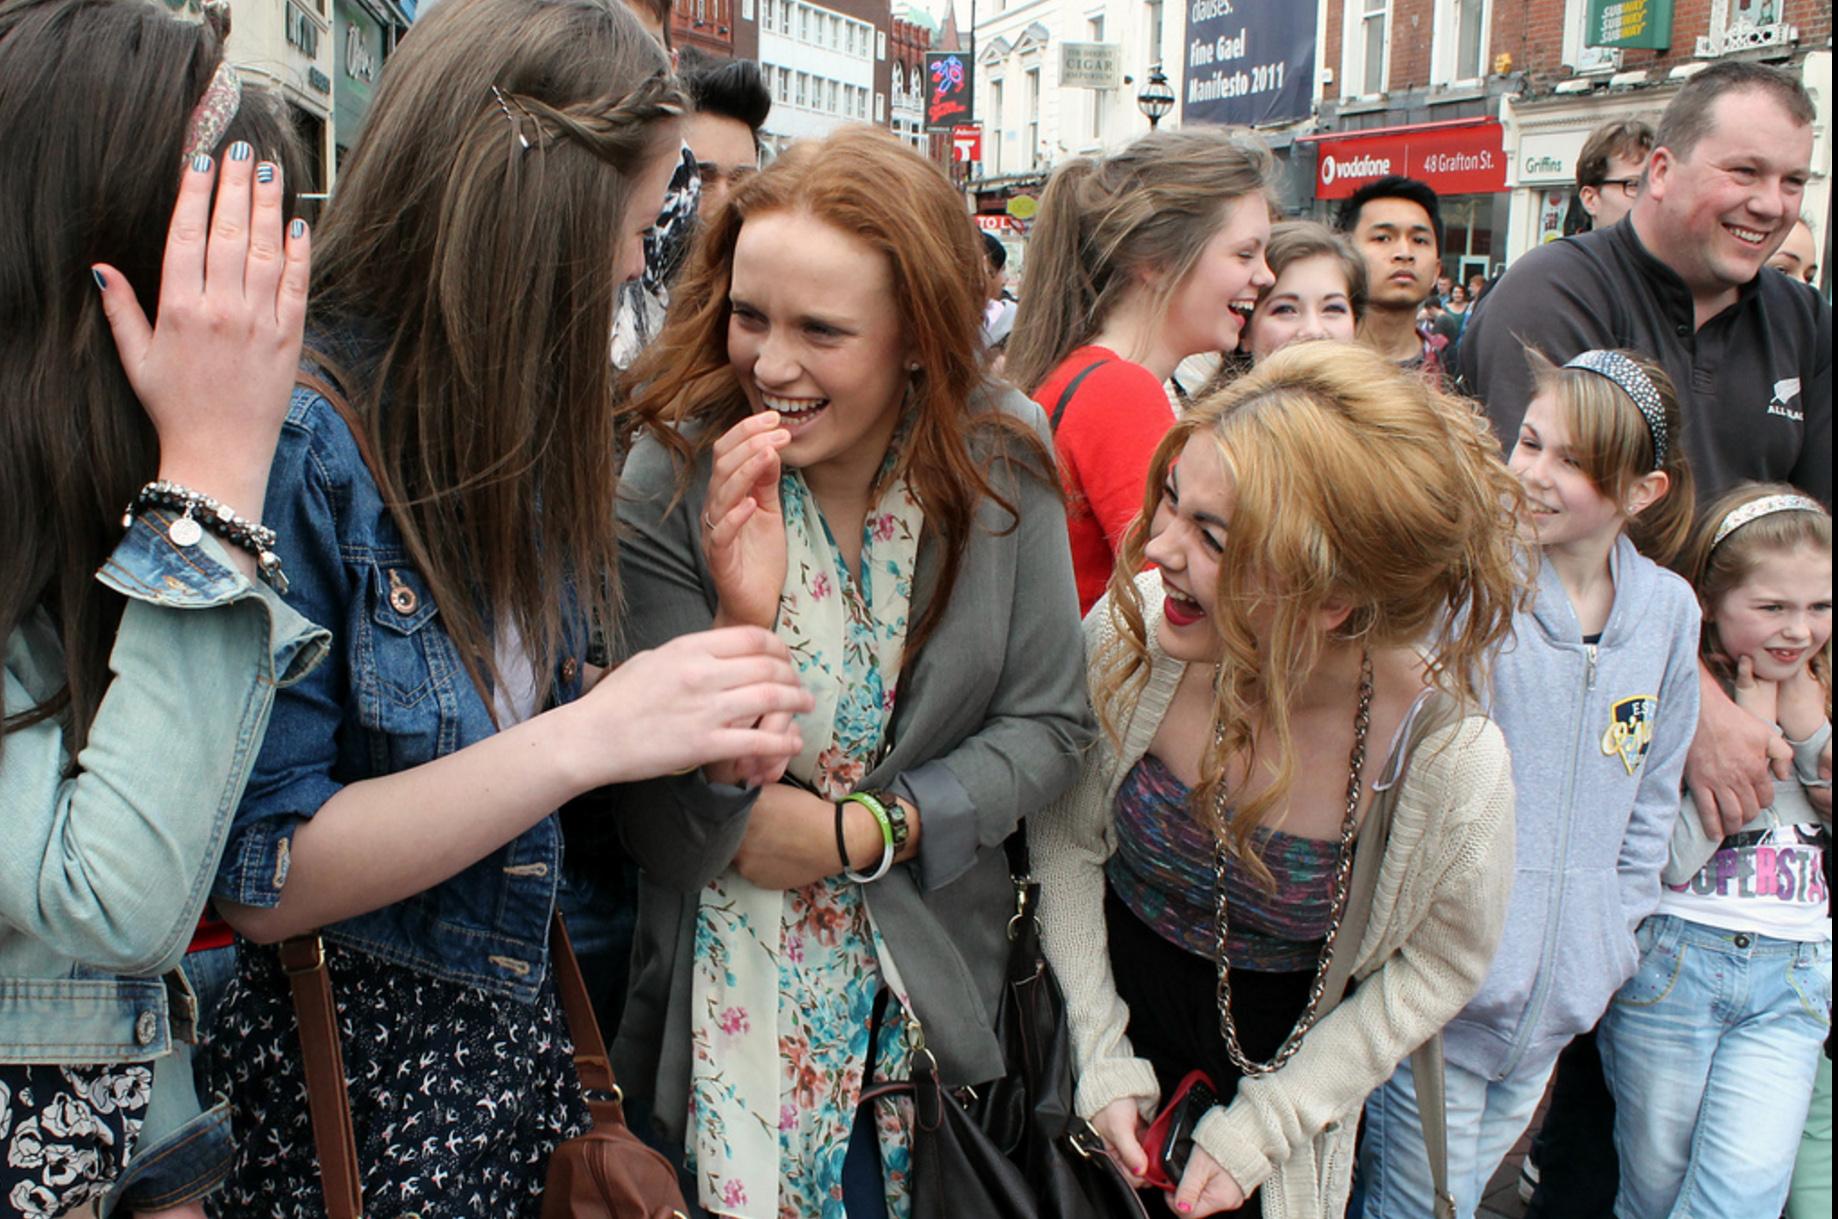 Dublin, 2012 (Danielle Houghton/GroundTruth)